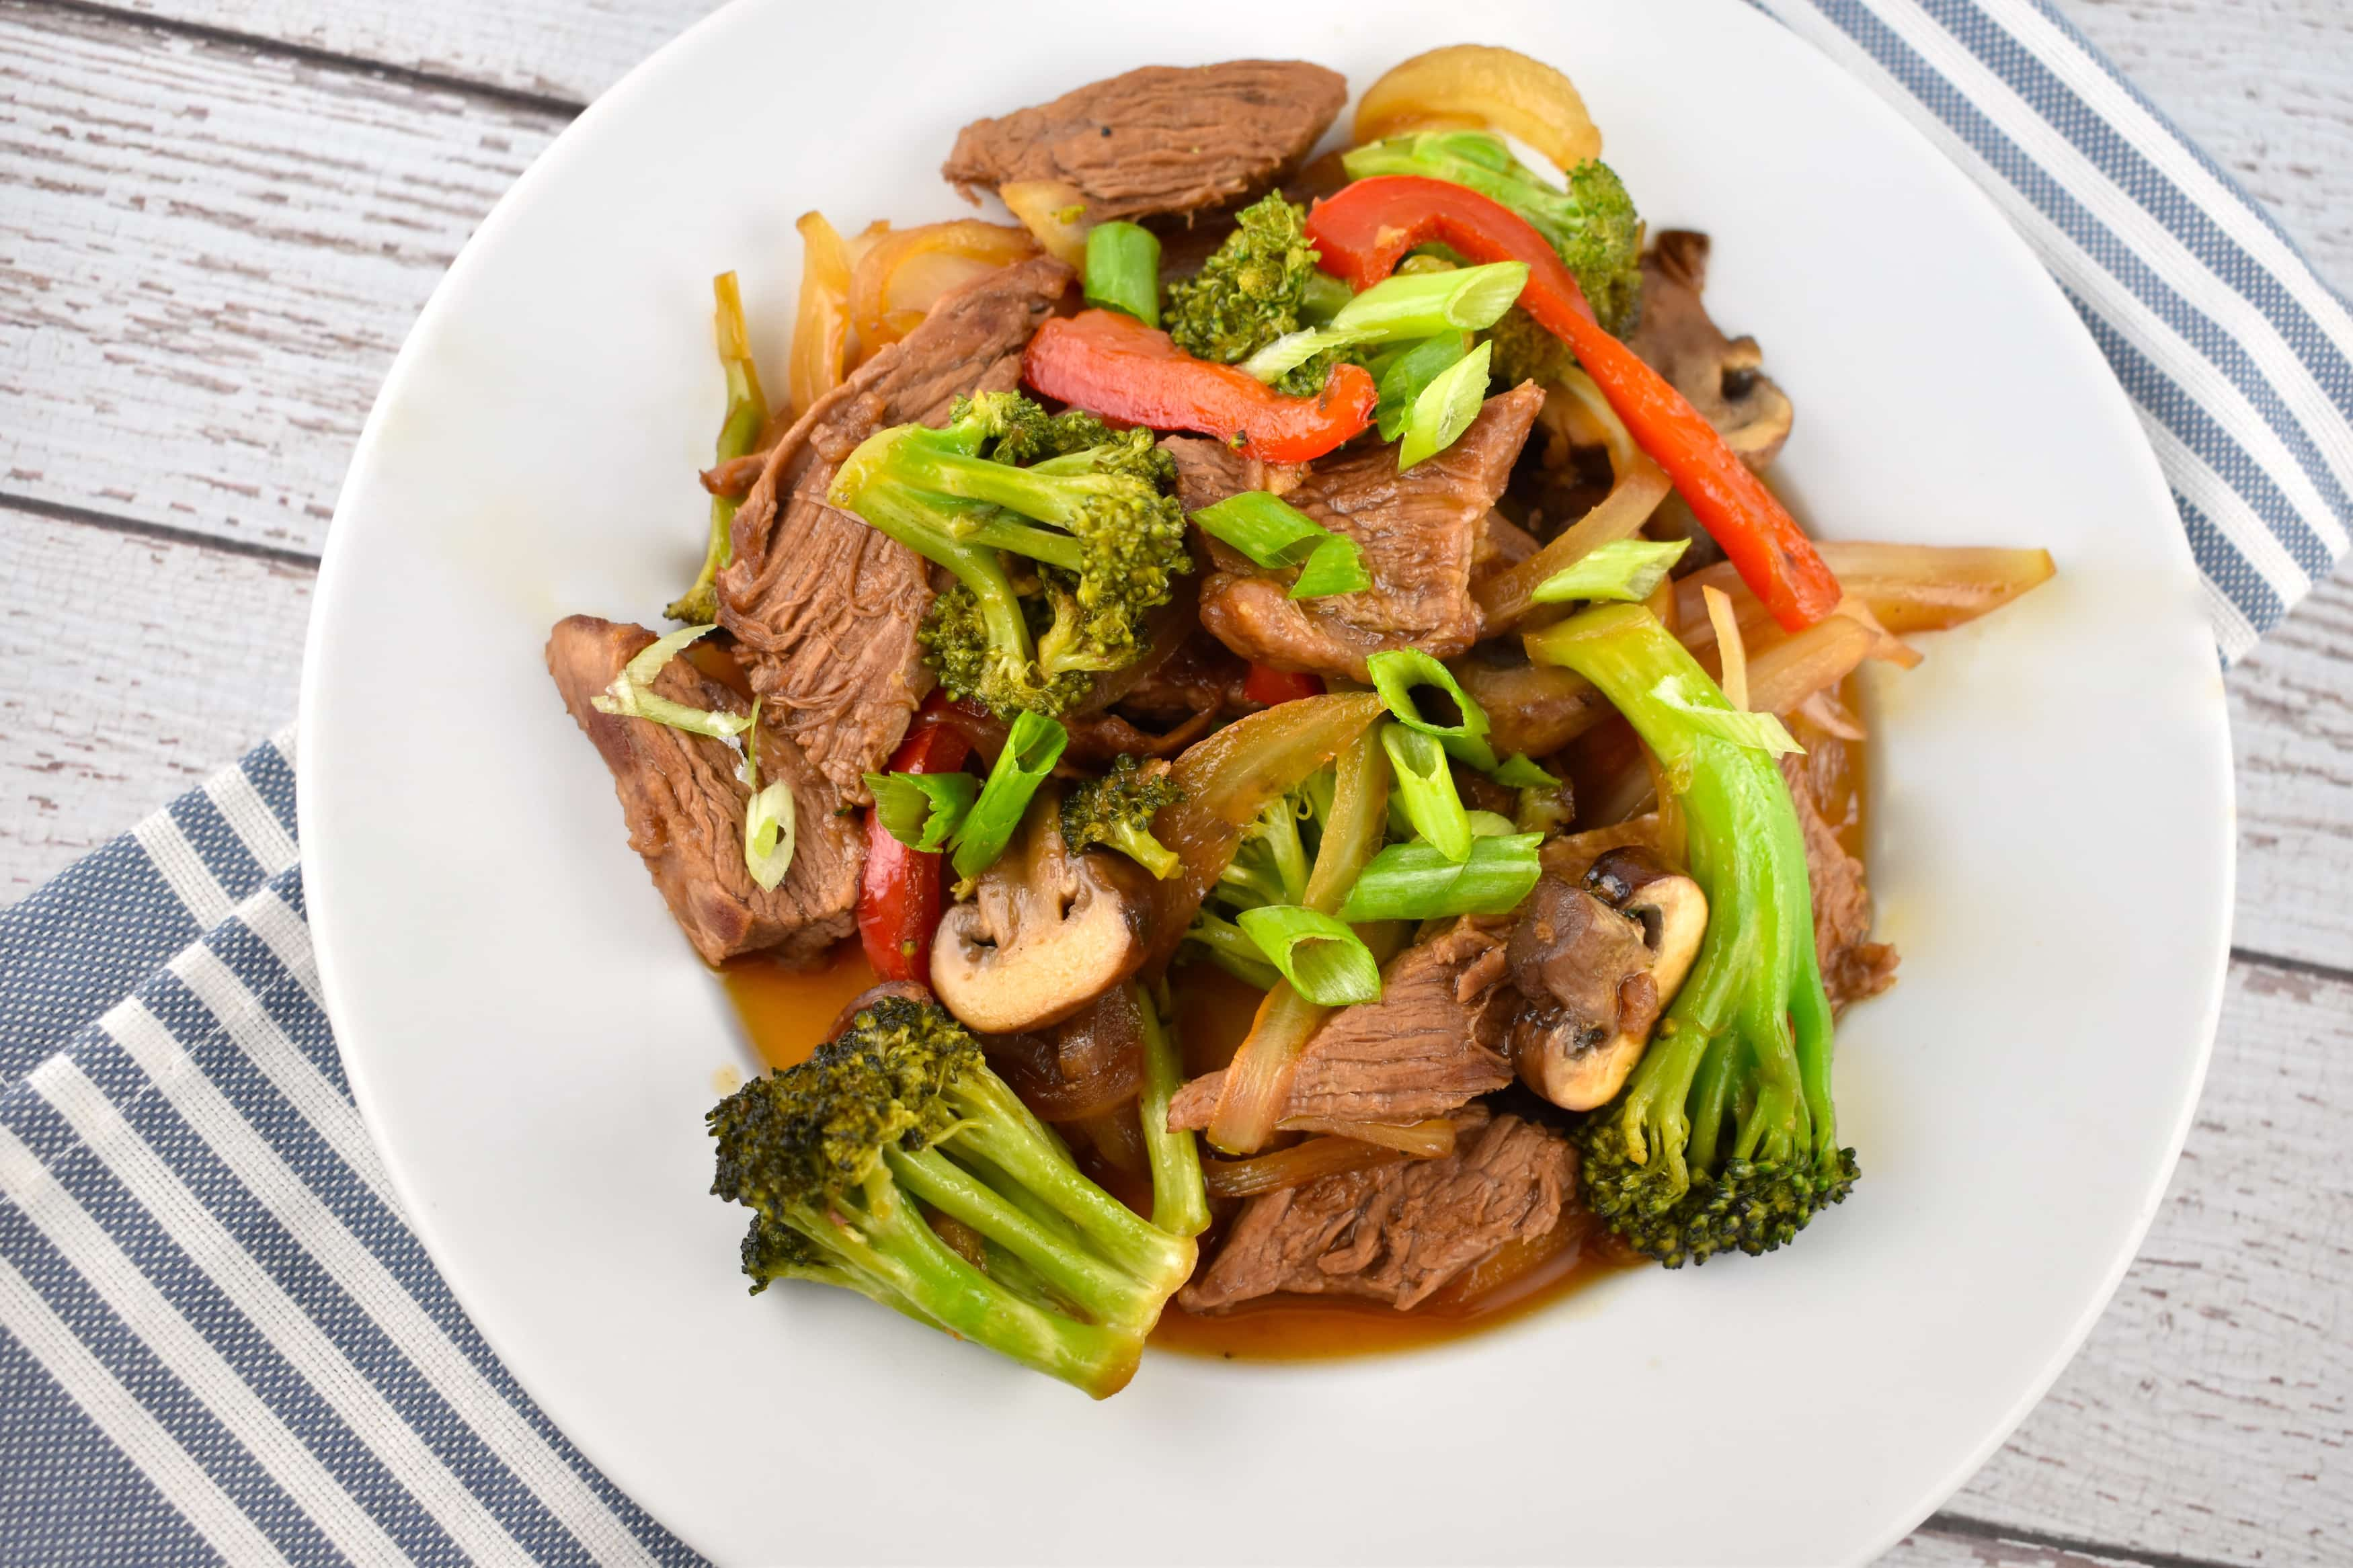 Beef And Vegetable Stir Fry Recipe 6 Points Laaloosh